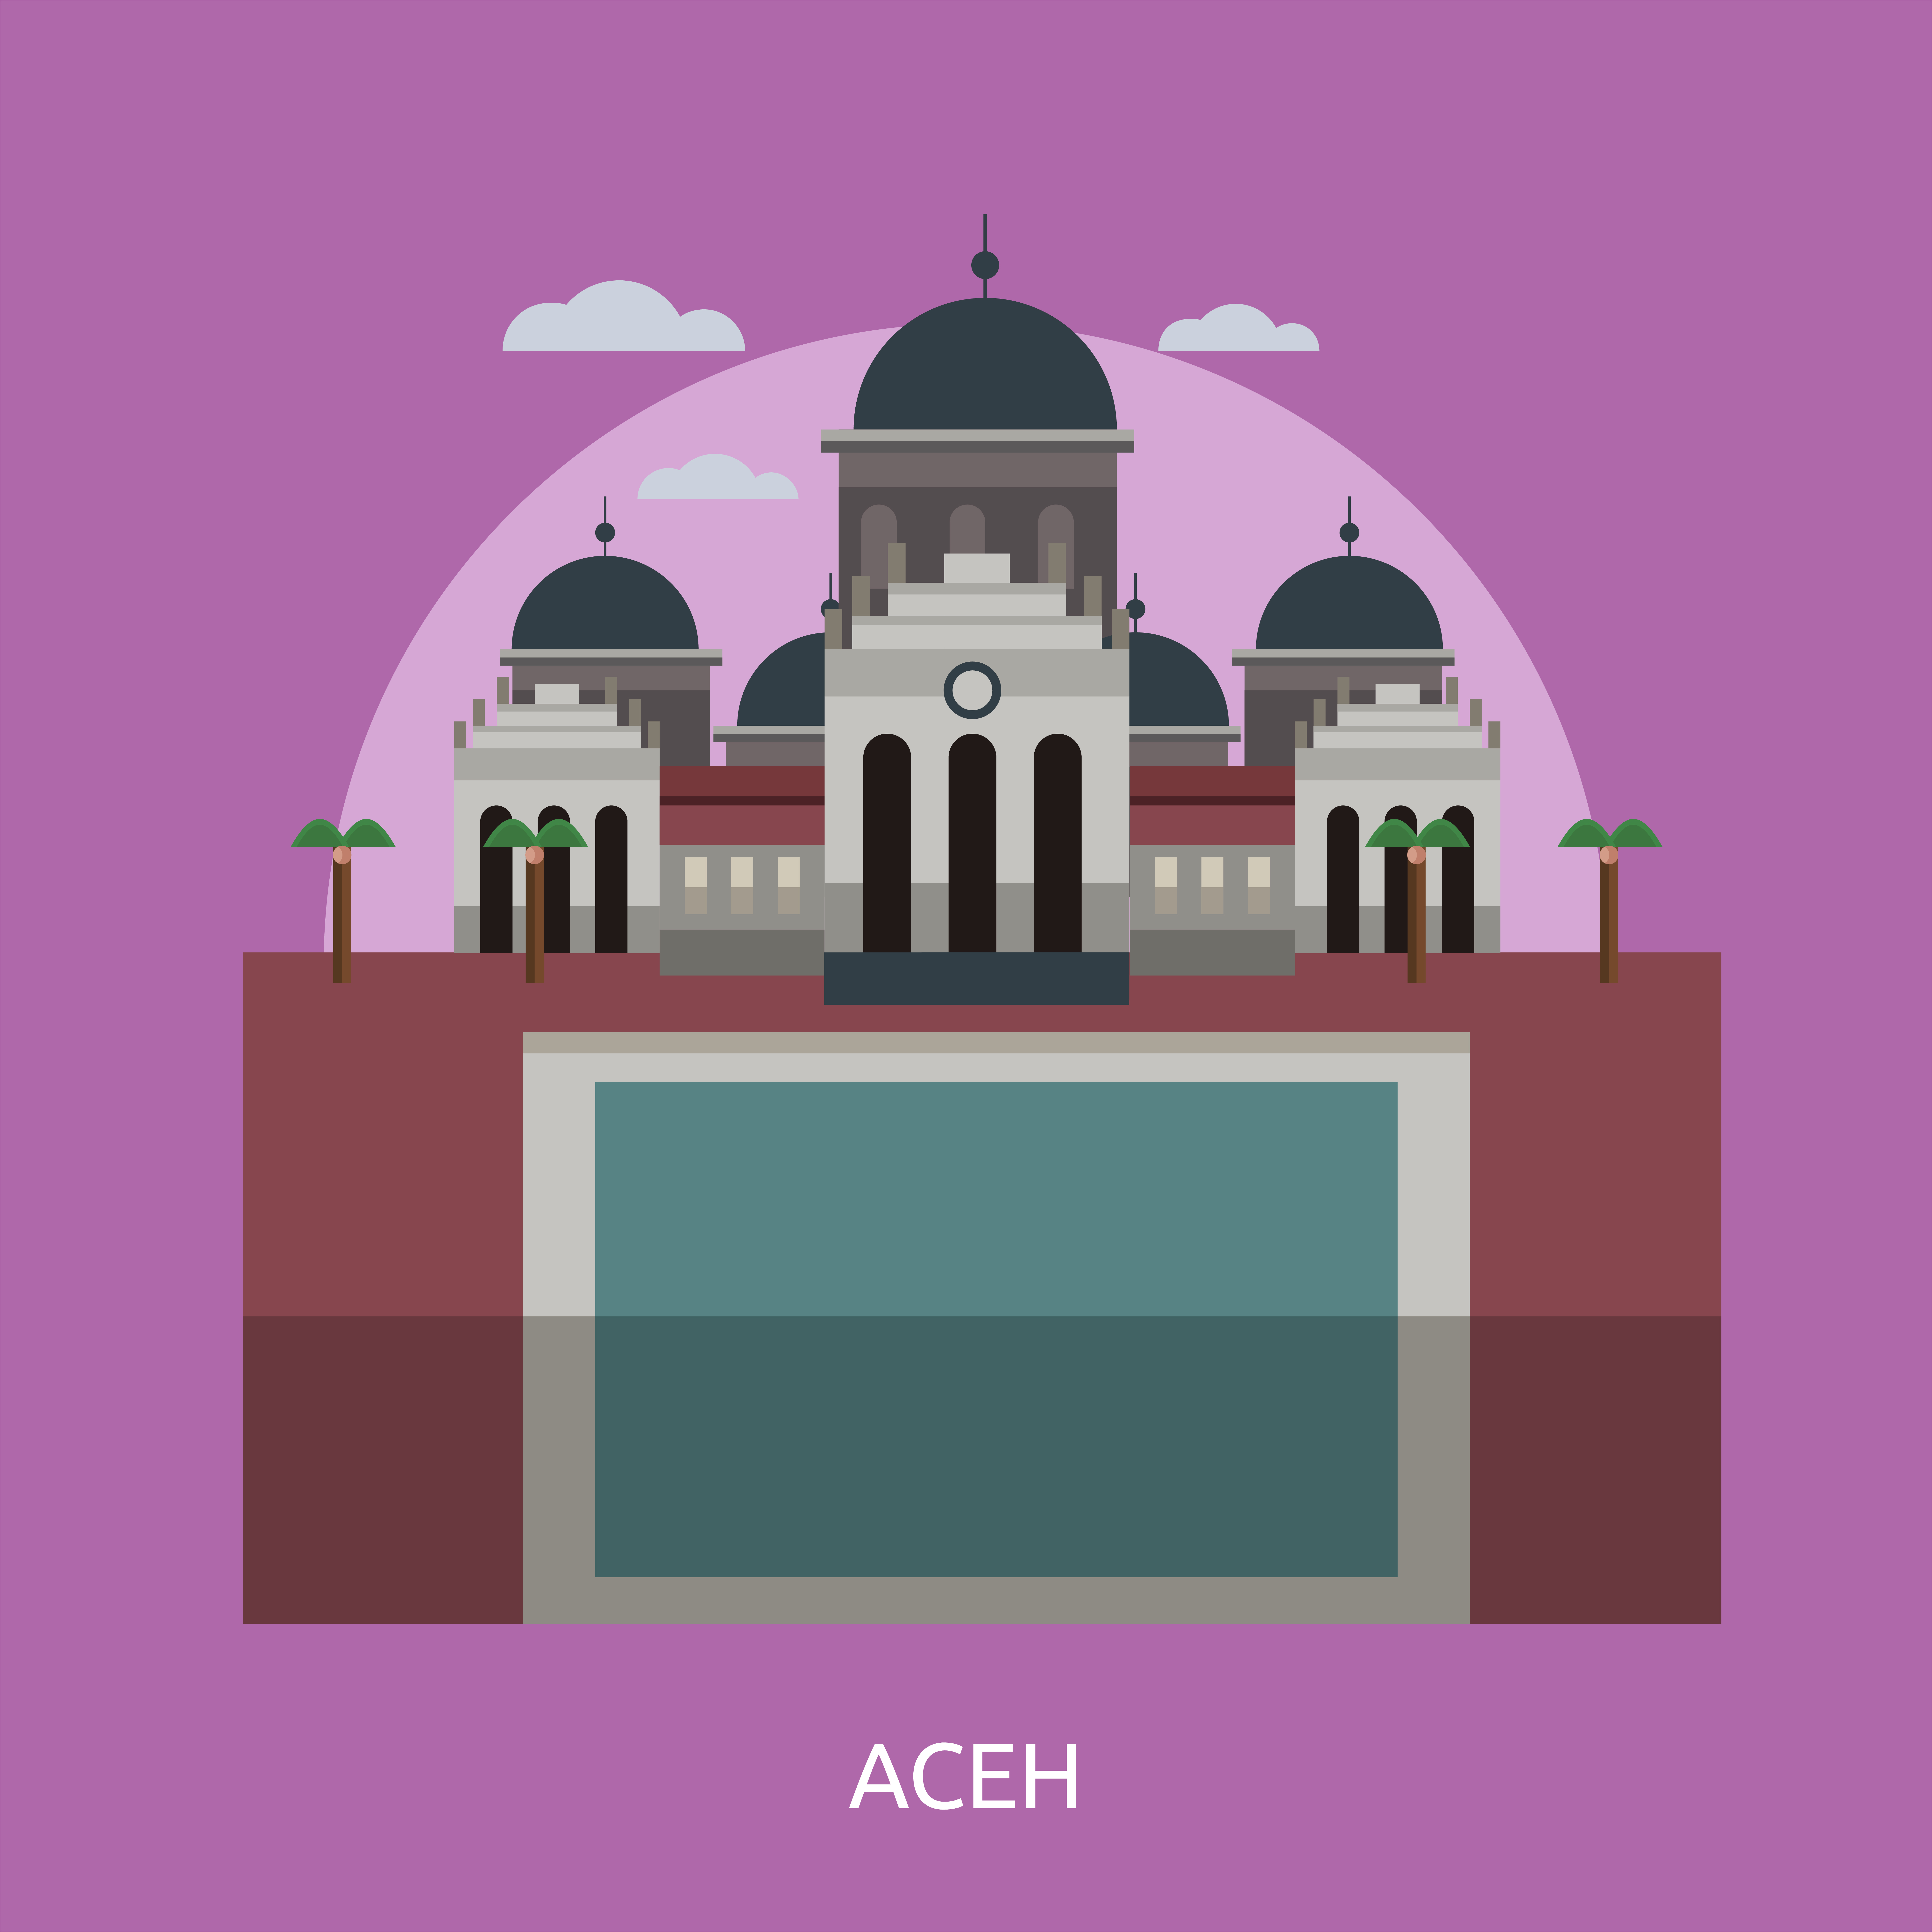 Aceh Conceptual Illustration Design